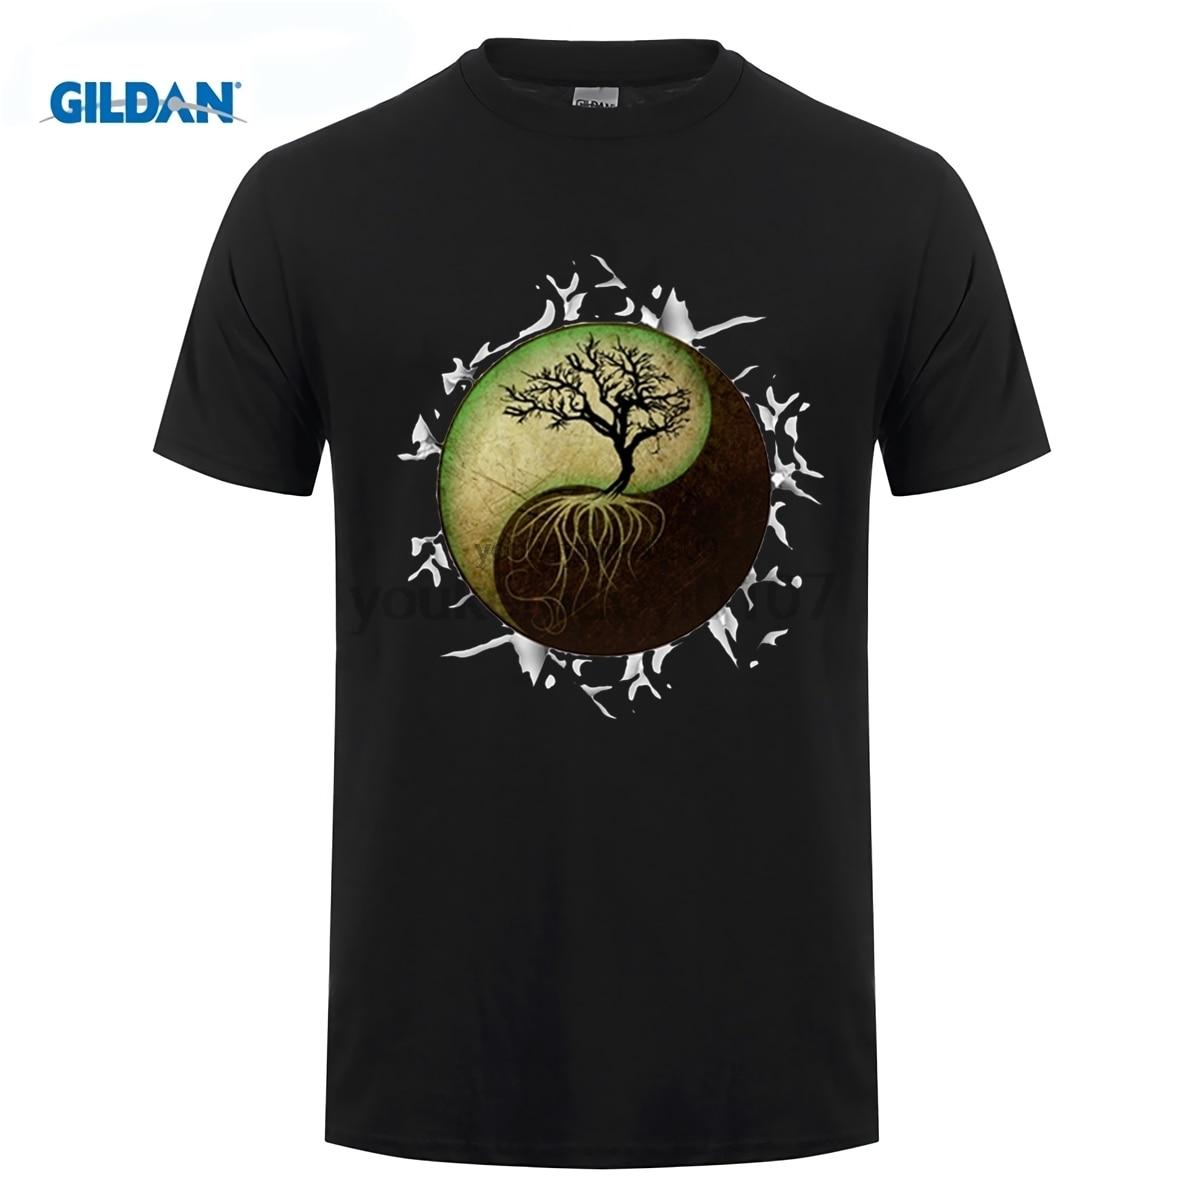 gildan Fashion Yin Yang Tree Design Men T-shirt Short Sleeve Customized t shirts Vintage Printed Cool Hipster tee Shirts